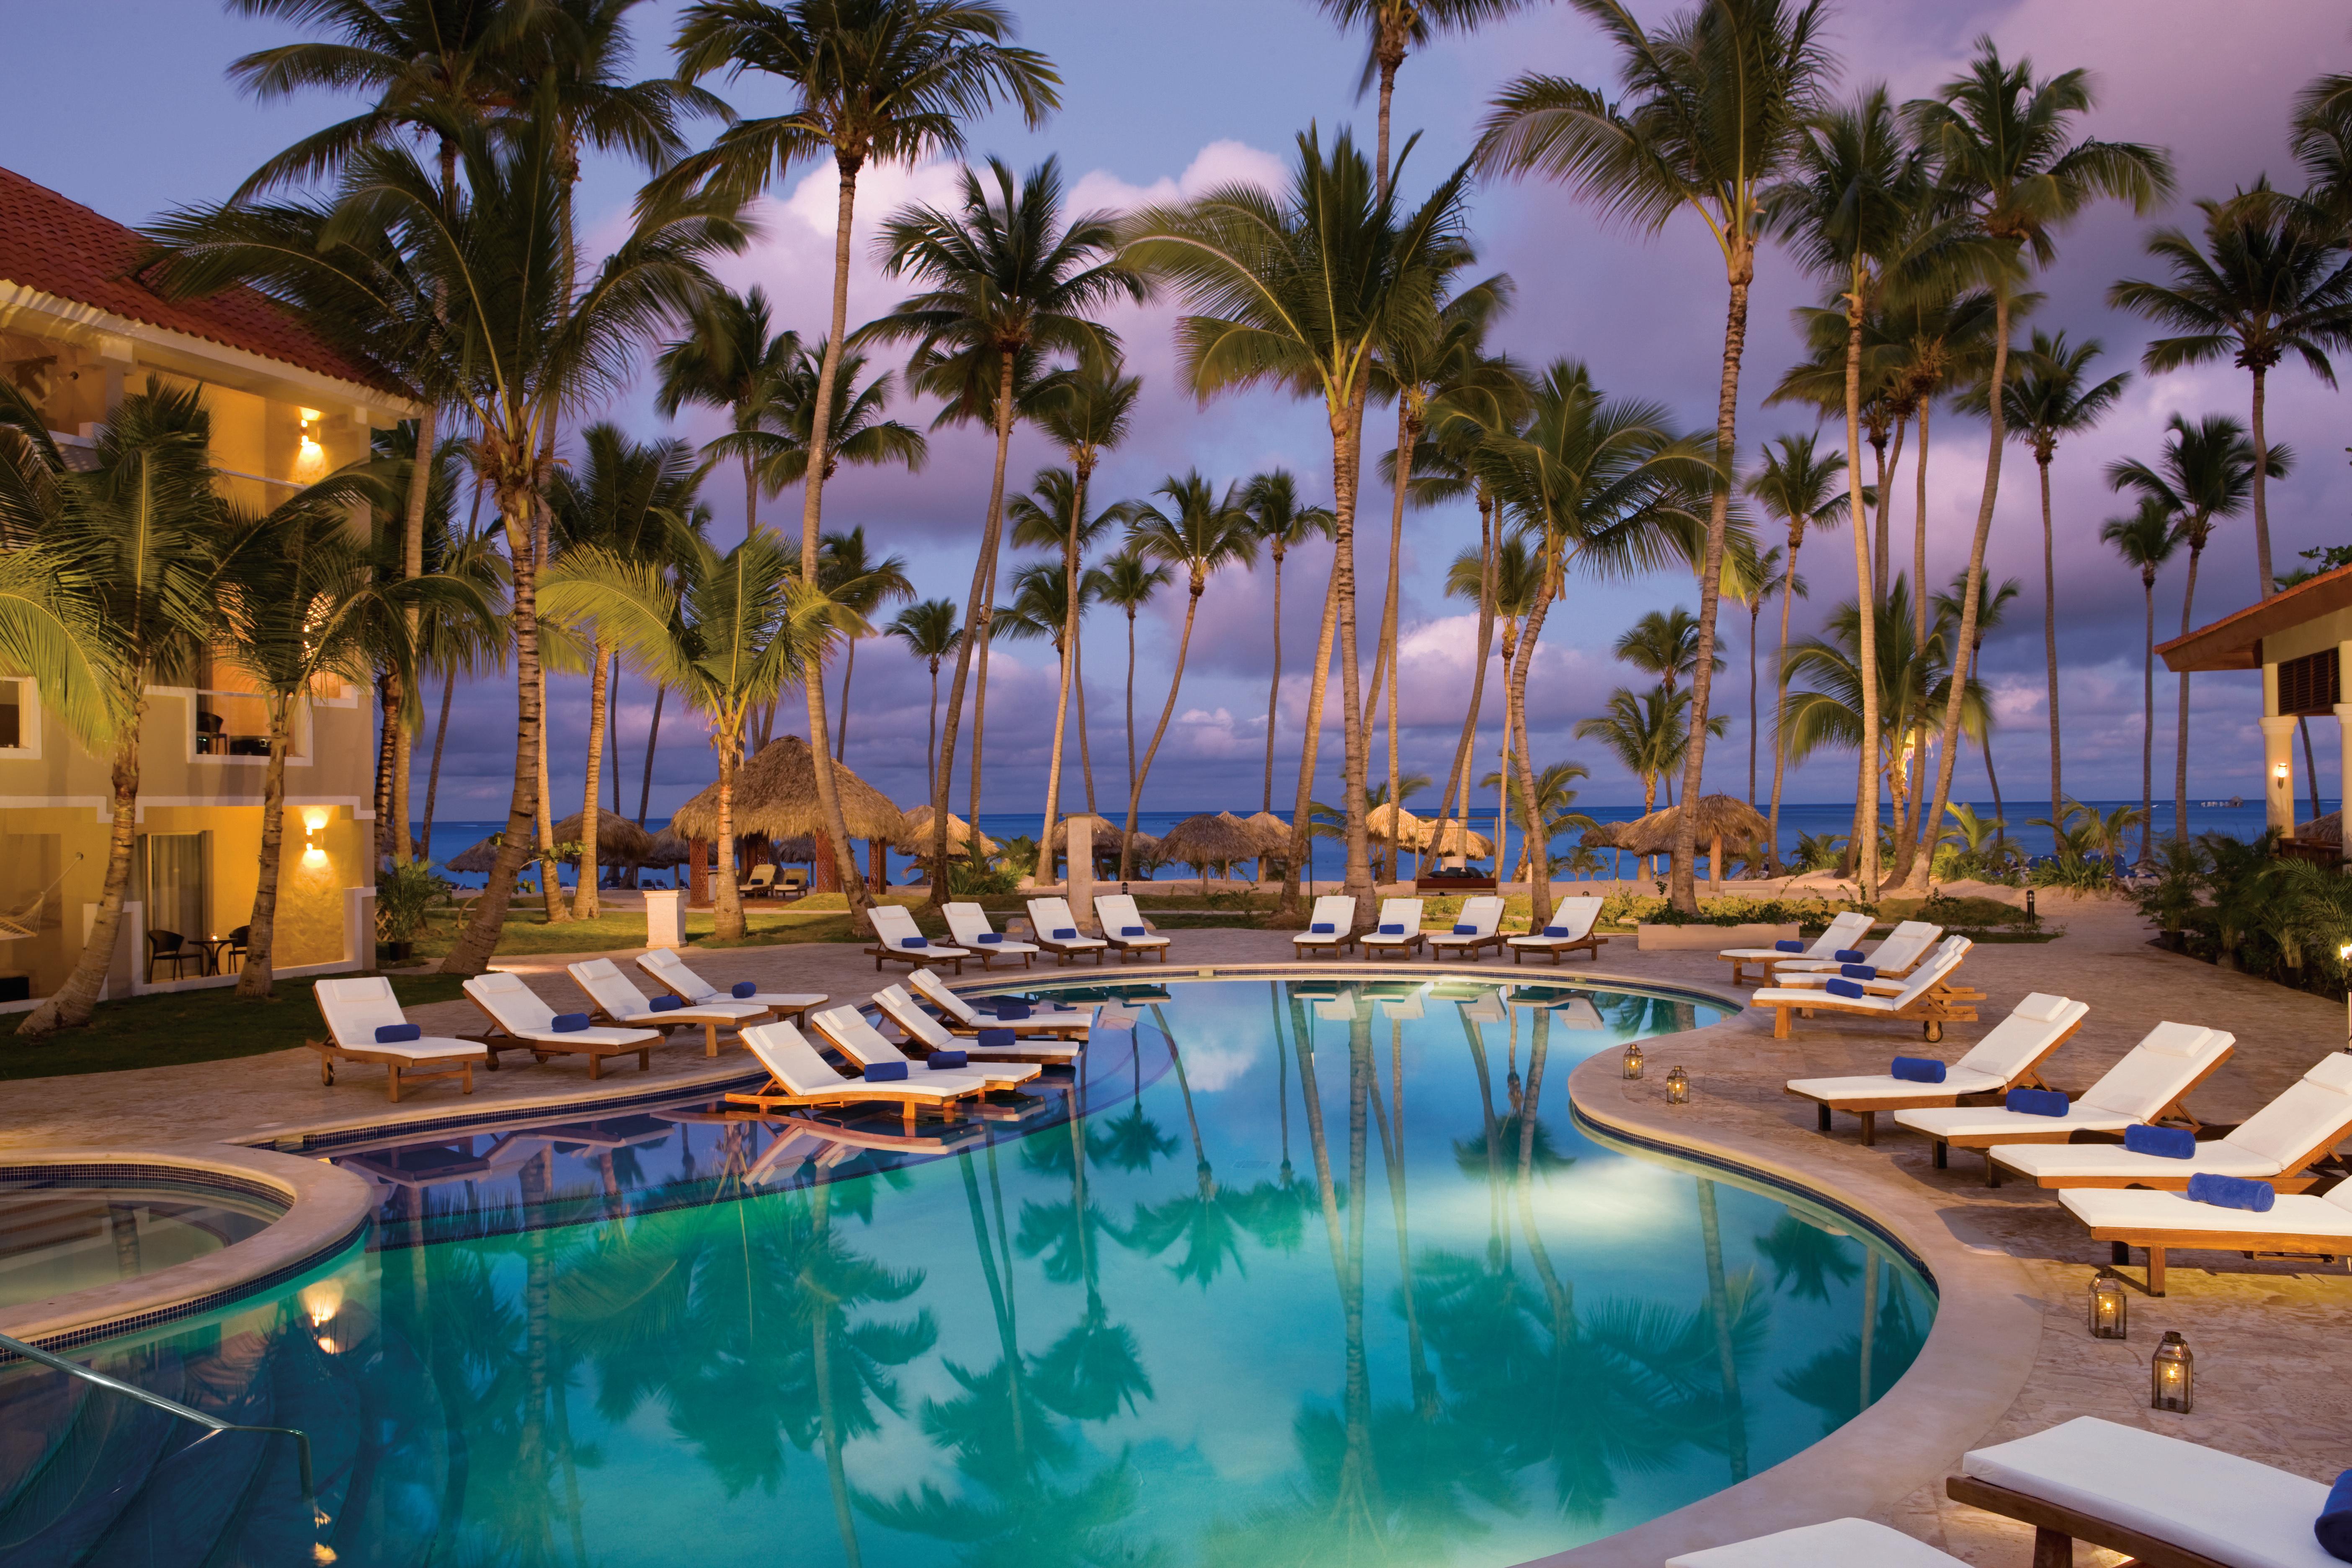 Travel Agency All-Inclusive Resort Dreams Palm Beach 03